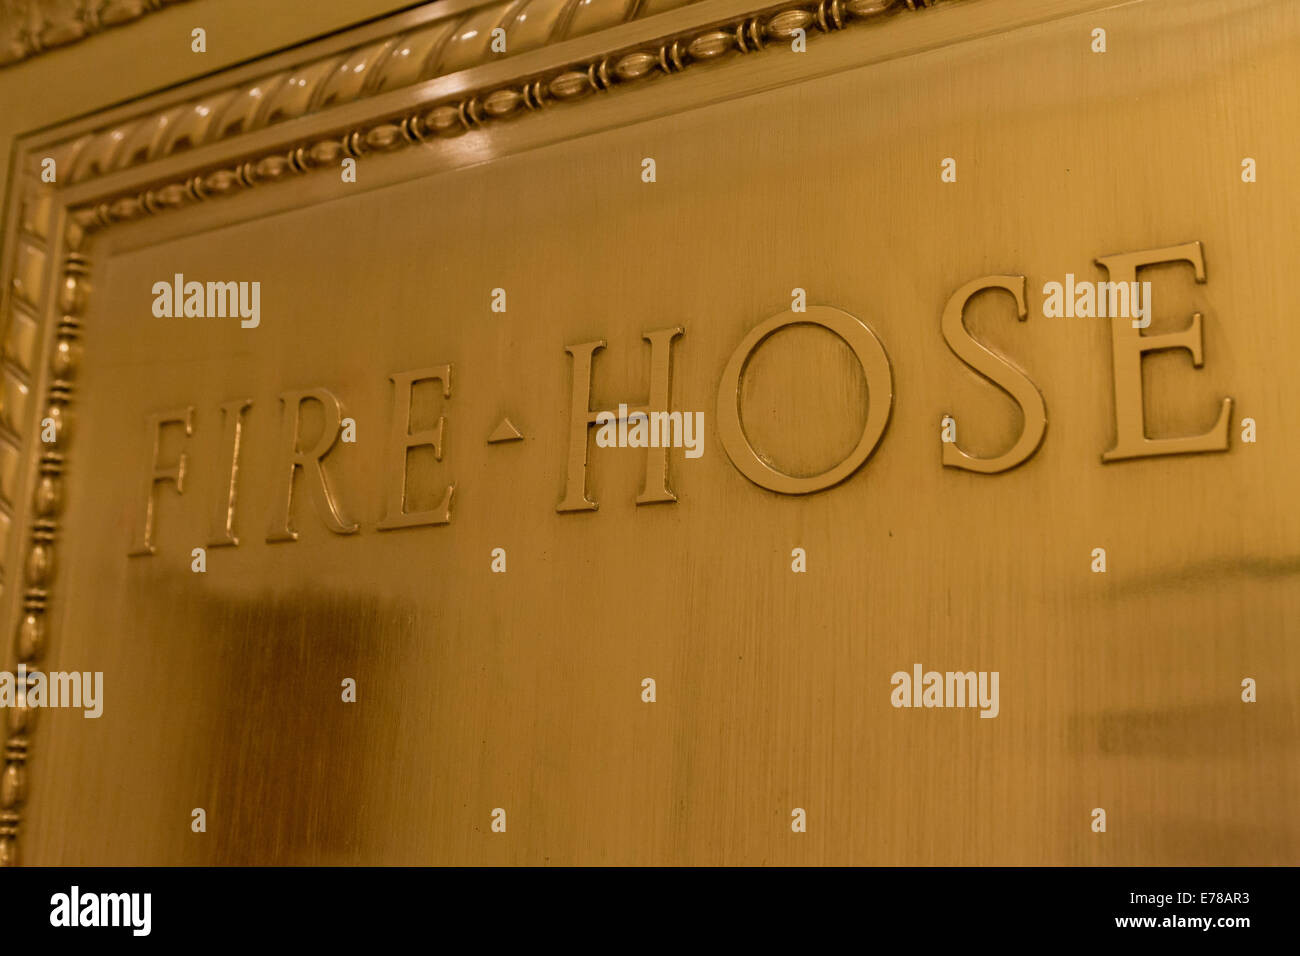 Fire hose box - USA - Stock Image